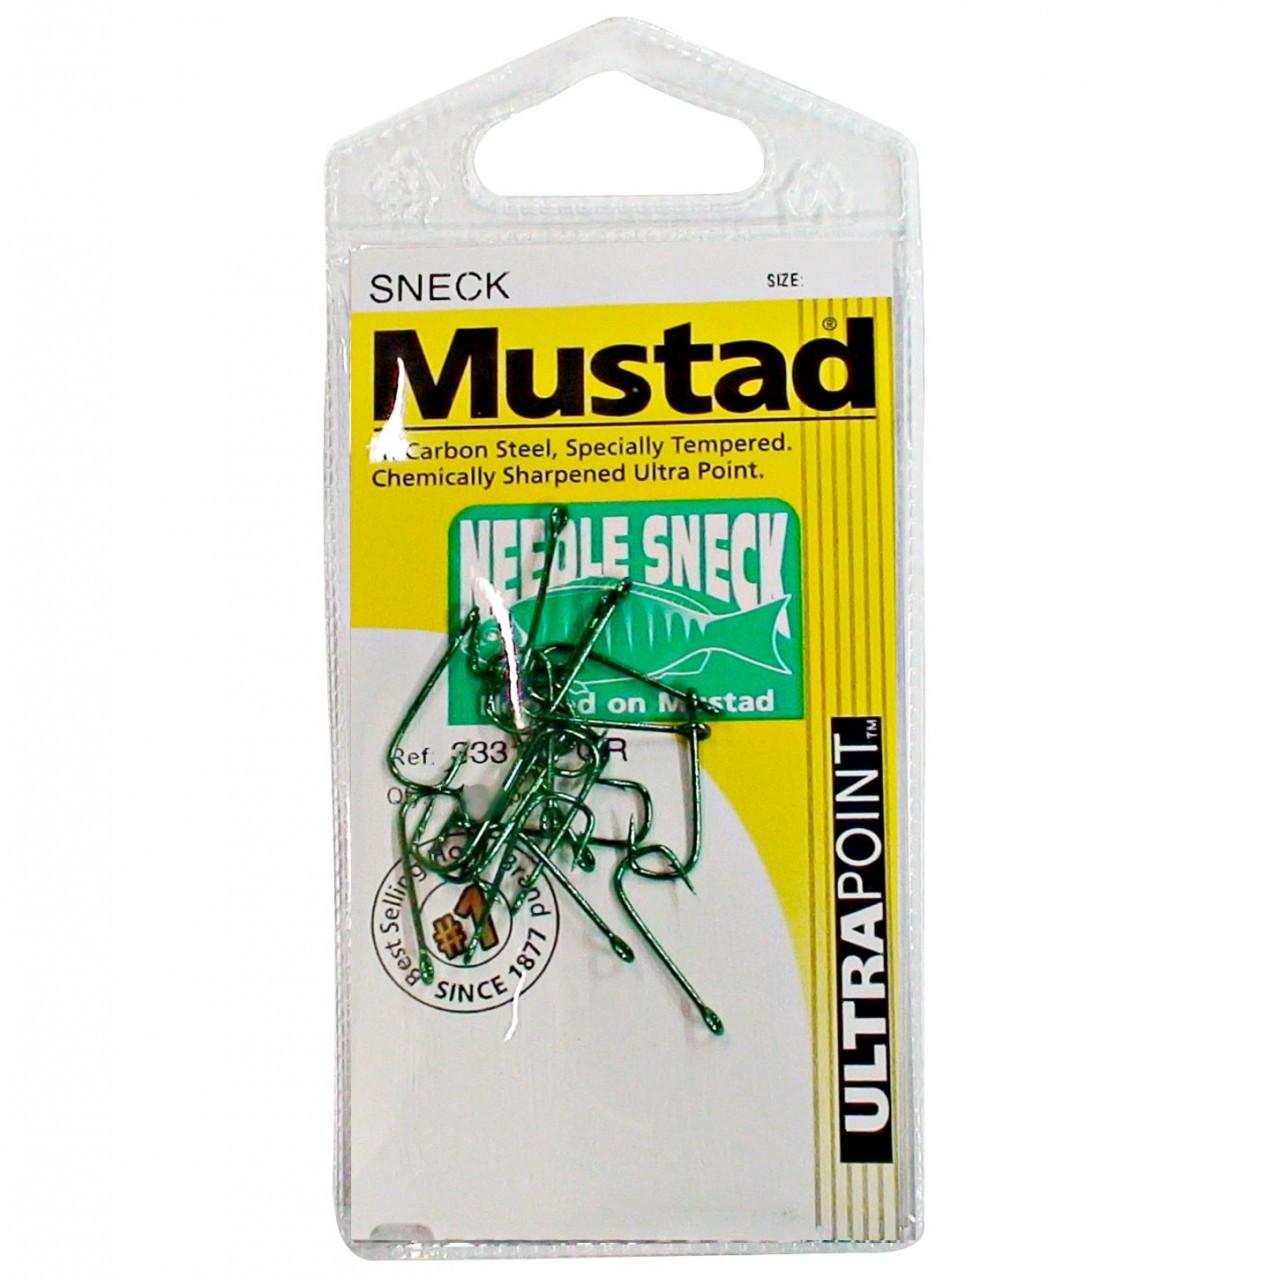 Image of Mustad Sneck Blackfish hooks